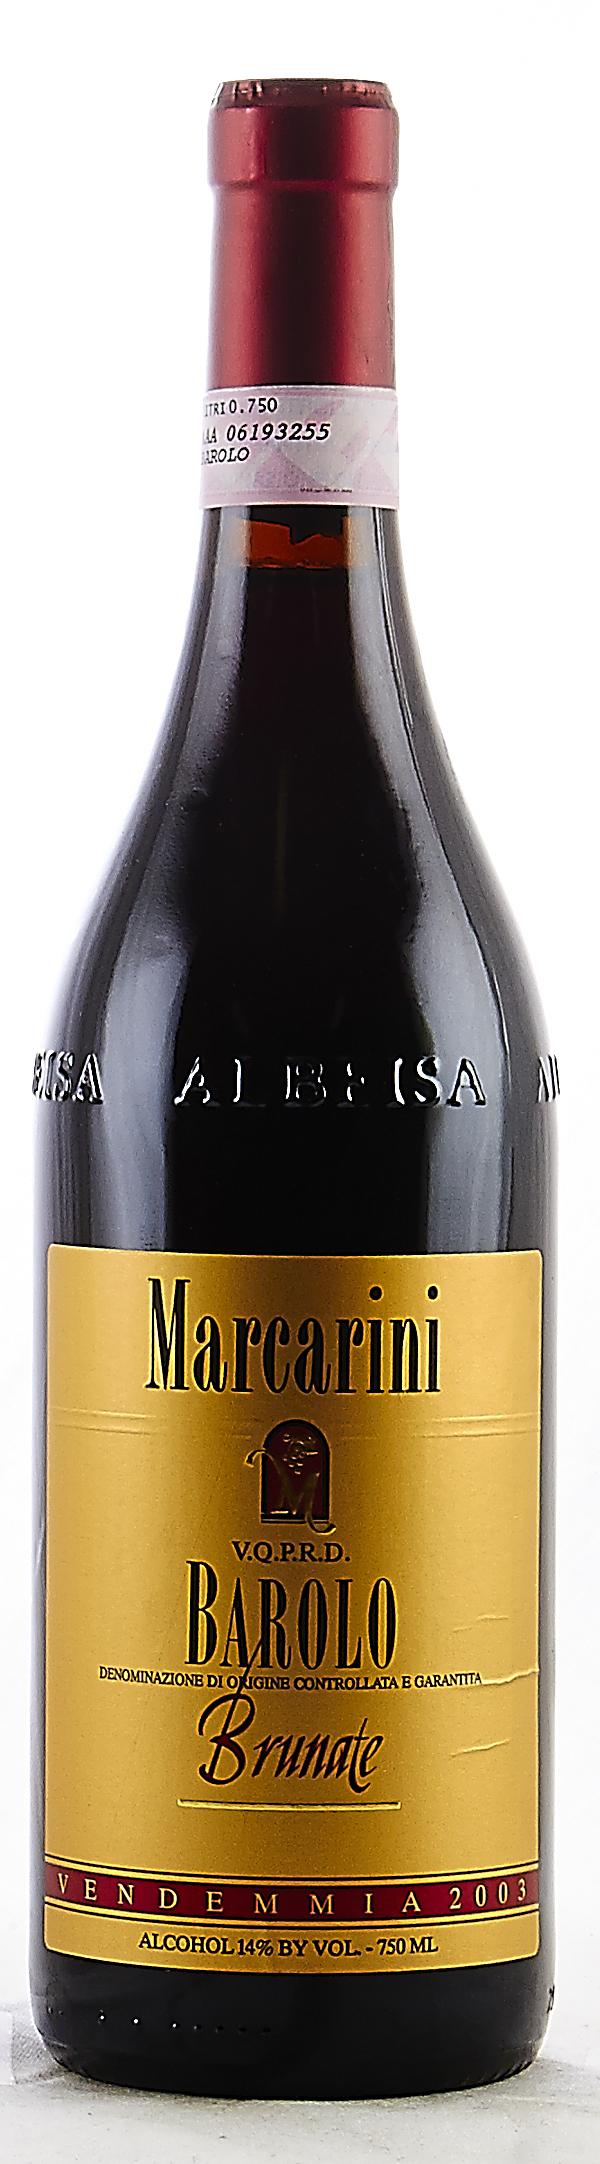 Barolo Brunate Marcarini 2003 Marcarini Barolo Brunate